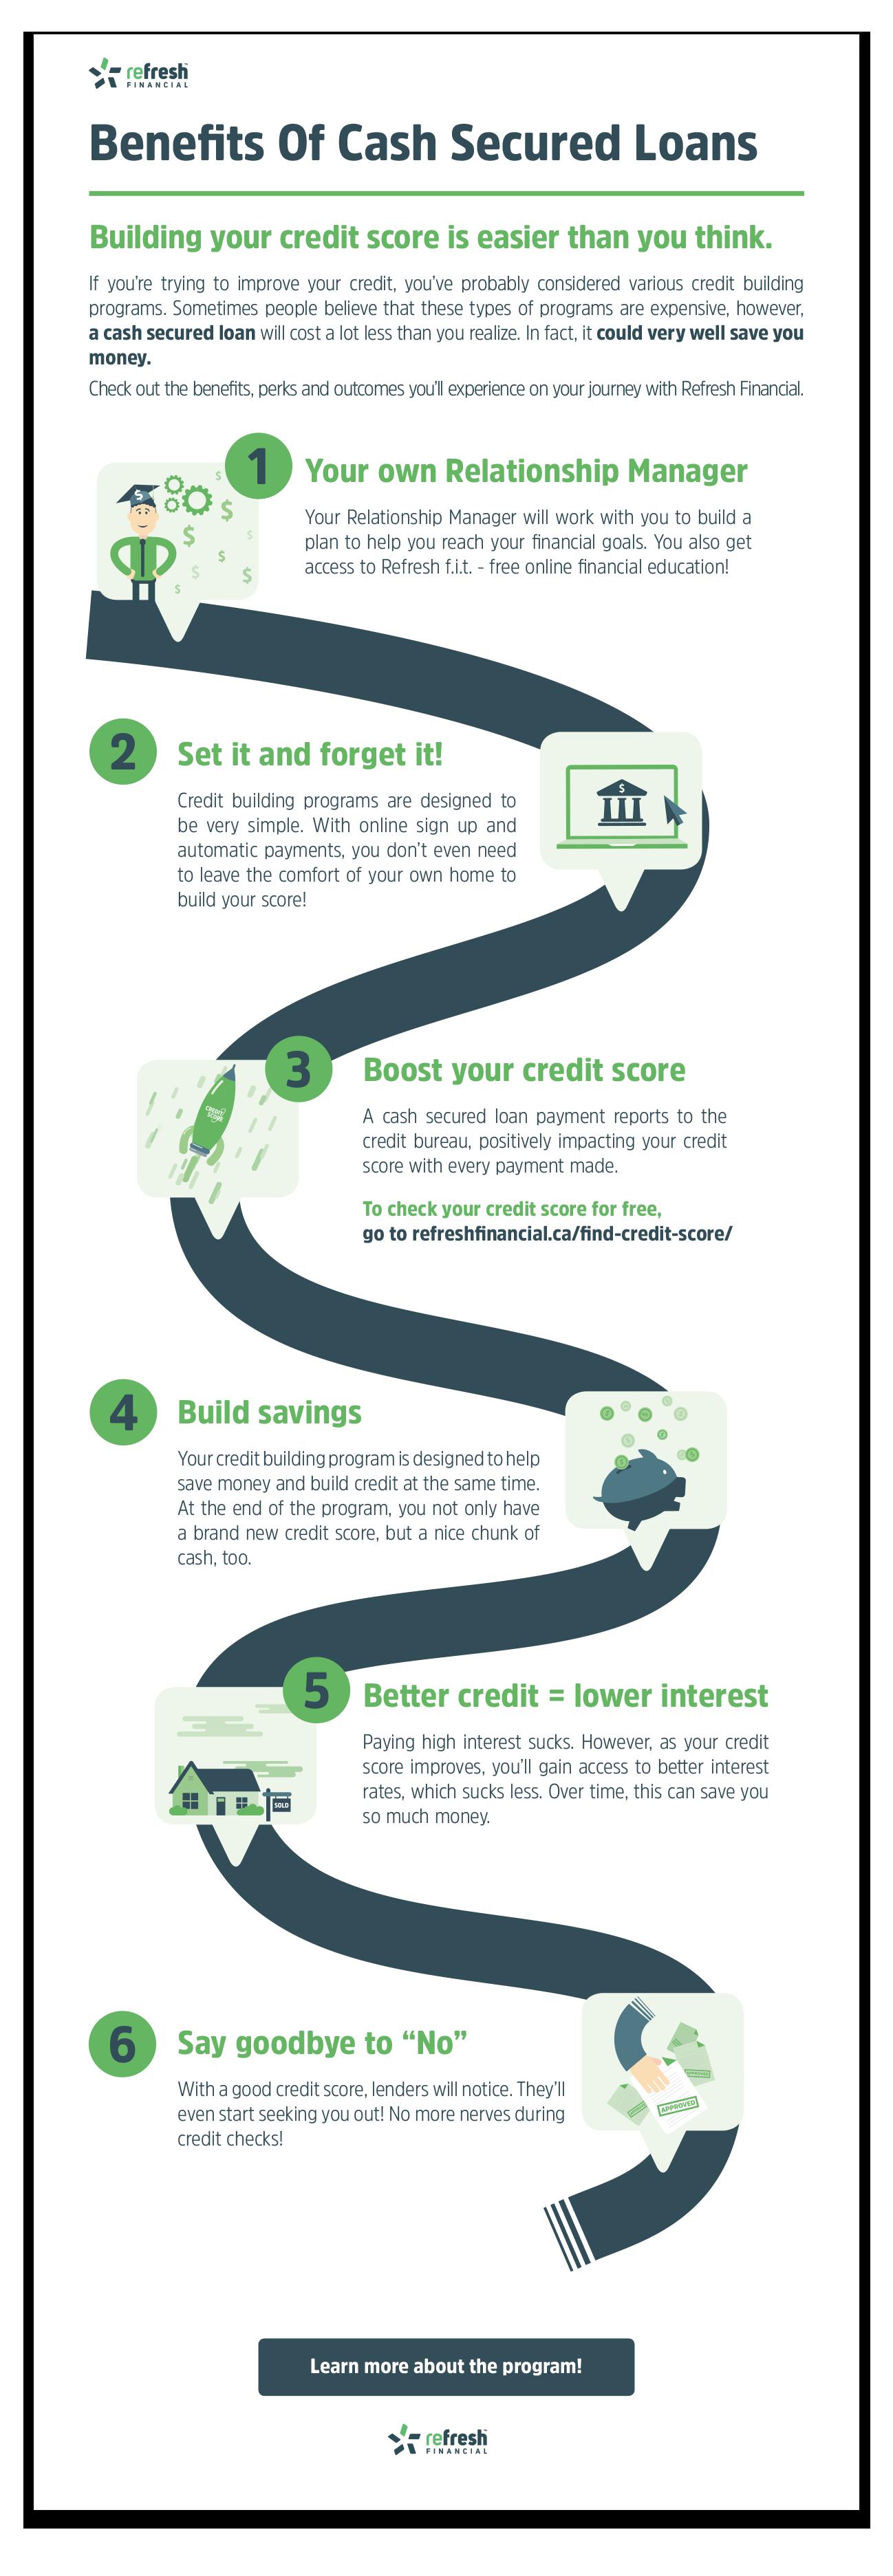 Credit builder programs